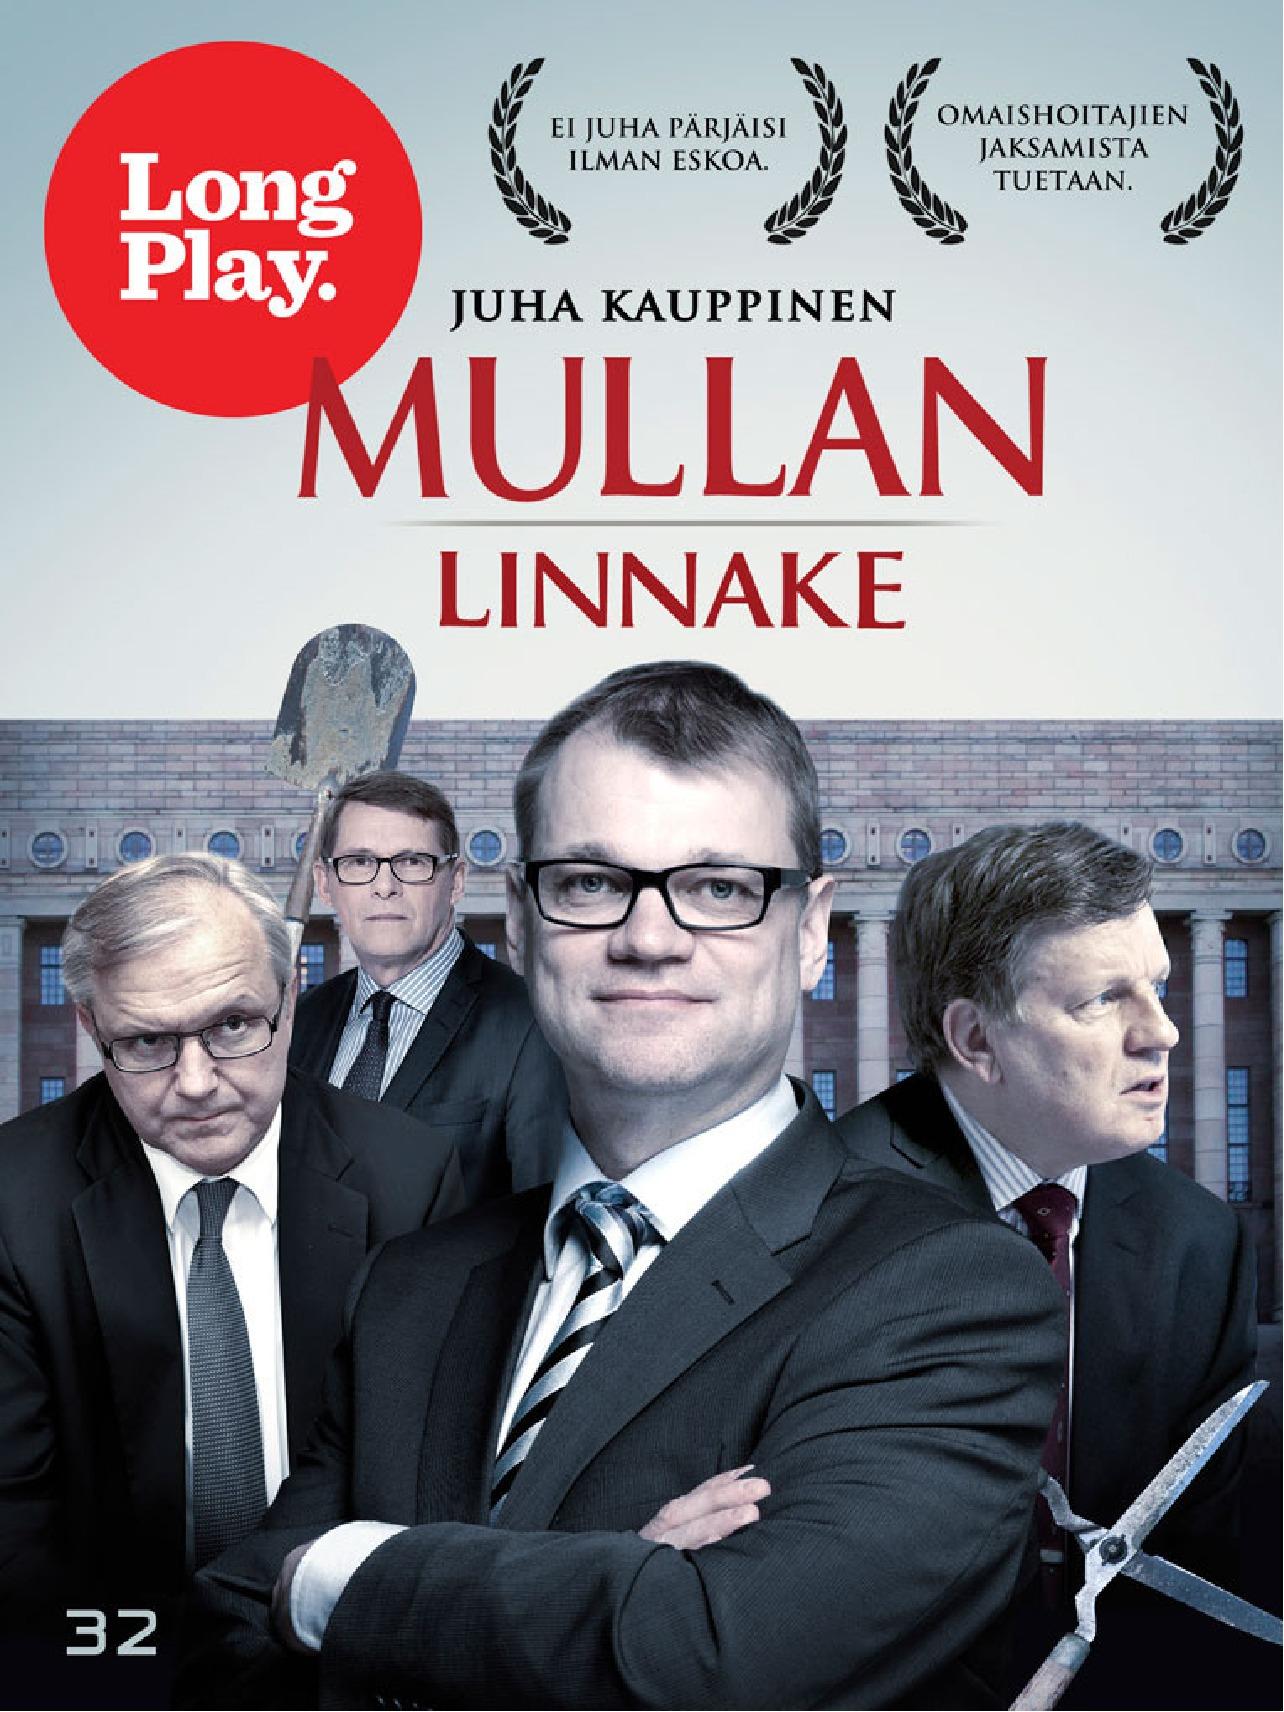 Mullan linnake  by  Juha Kauppinen